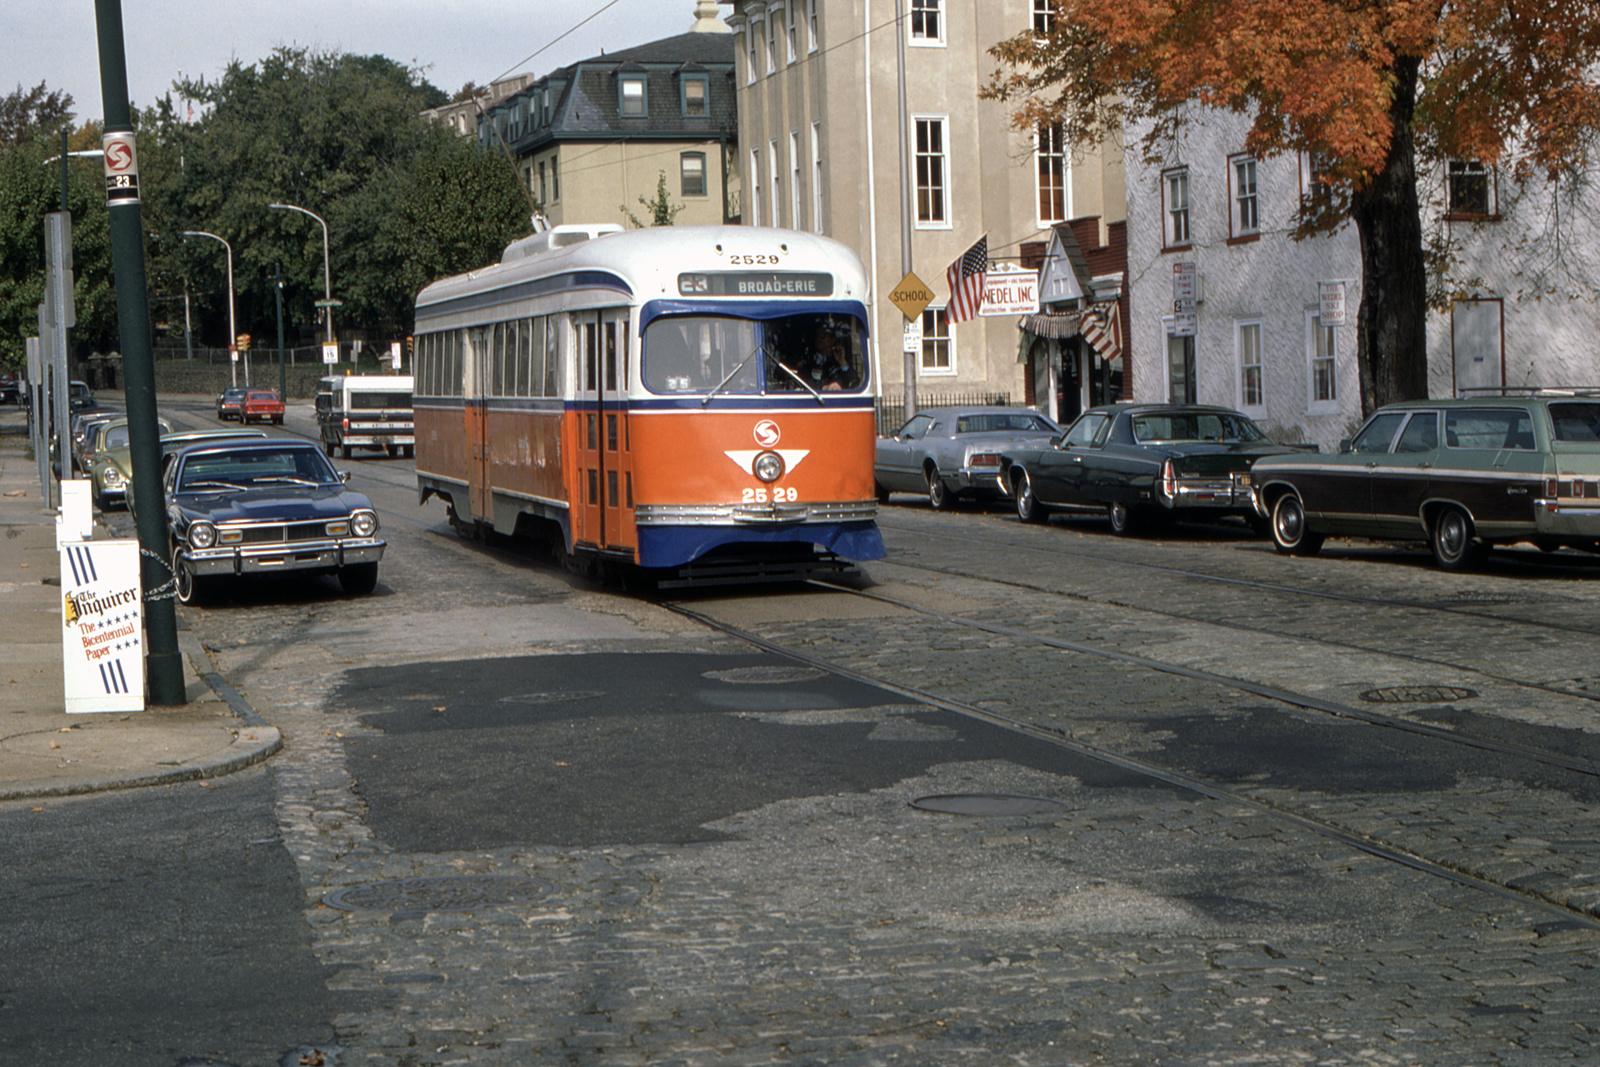 (879k, 1600x1067)<br><b>Country:</b> United States<br><b>City:</b> Philadelphia, PA<br><b>System:</b> SEPTA (or Predecessor)<br><b>Line:</b> Rt. 23-Germantown<br><b>Location:</b> Germantown/Hartwell<br><b>Car:</b> PTC/SEPTA Pre-war Air-car PCC (St.Louis, 1940) 2529 <br><b>Collection of:</b> David Pirmann<br><b>Date:</b> 10/1978<br><b>Viewed (this week/total):</b> 0 / 38